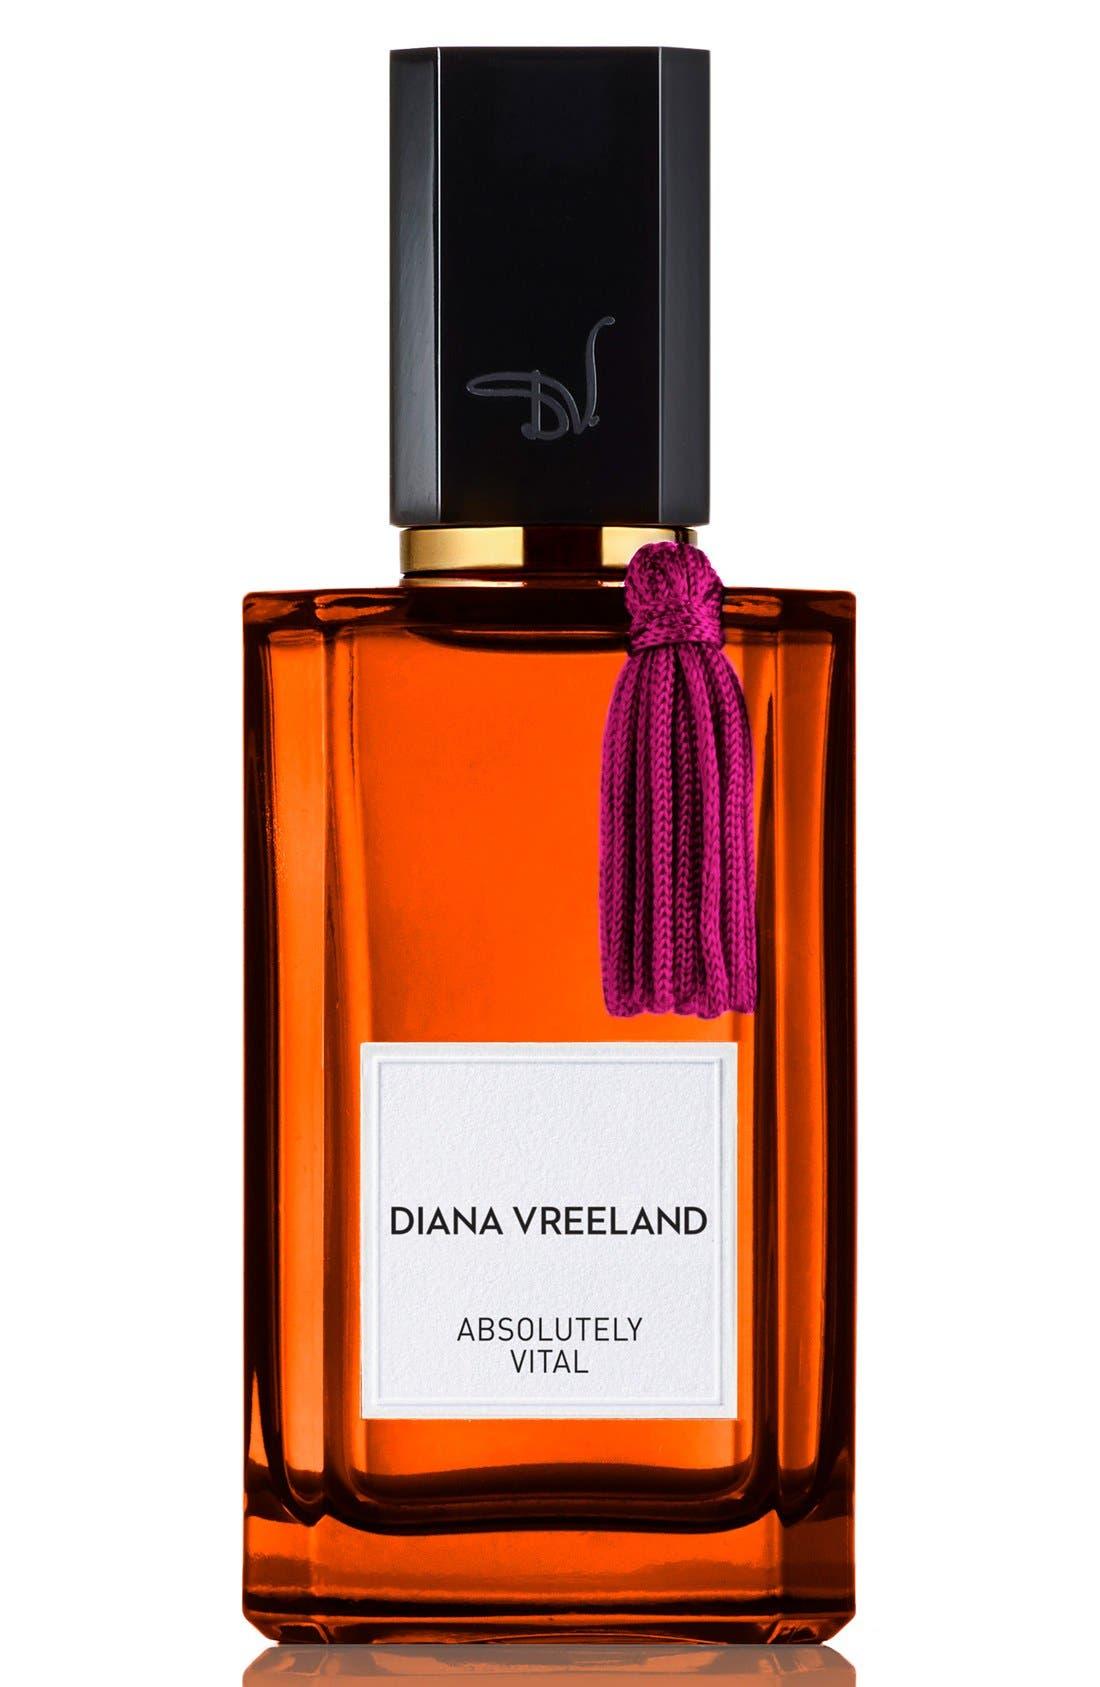 Diana Vreeland 'Absolutely Vital' Eau de Parfum